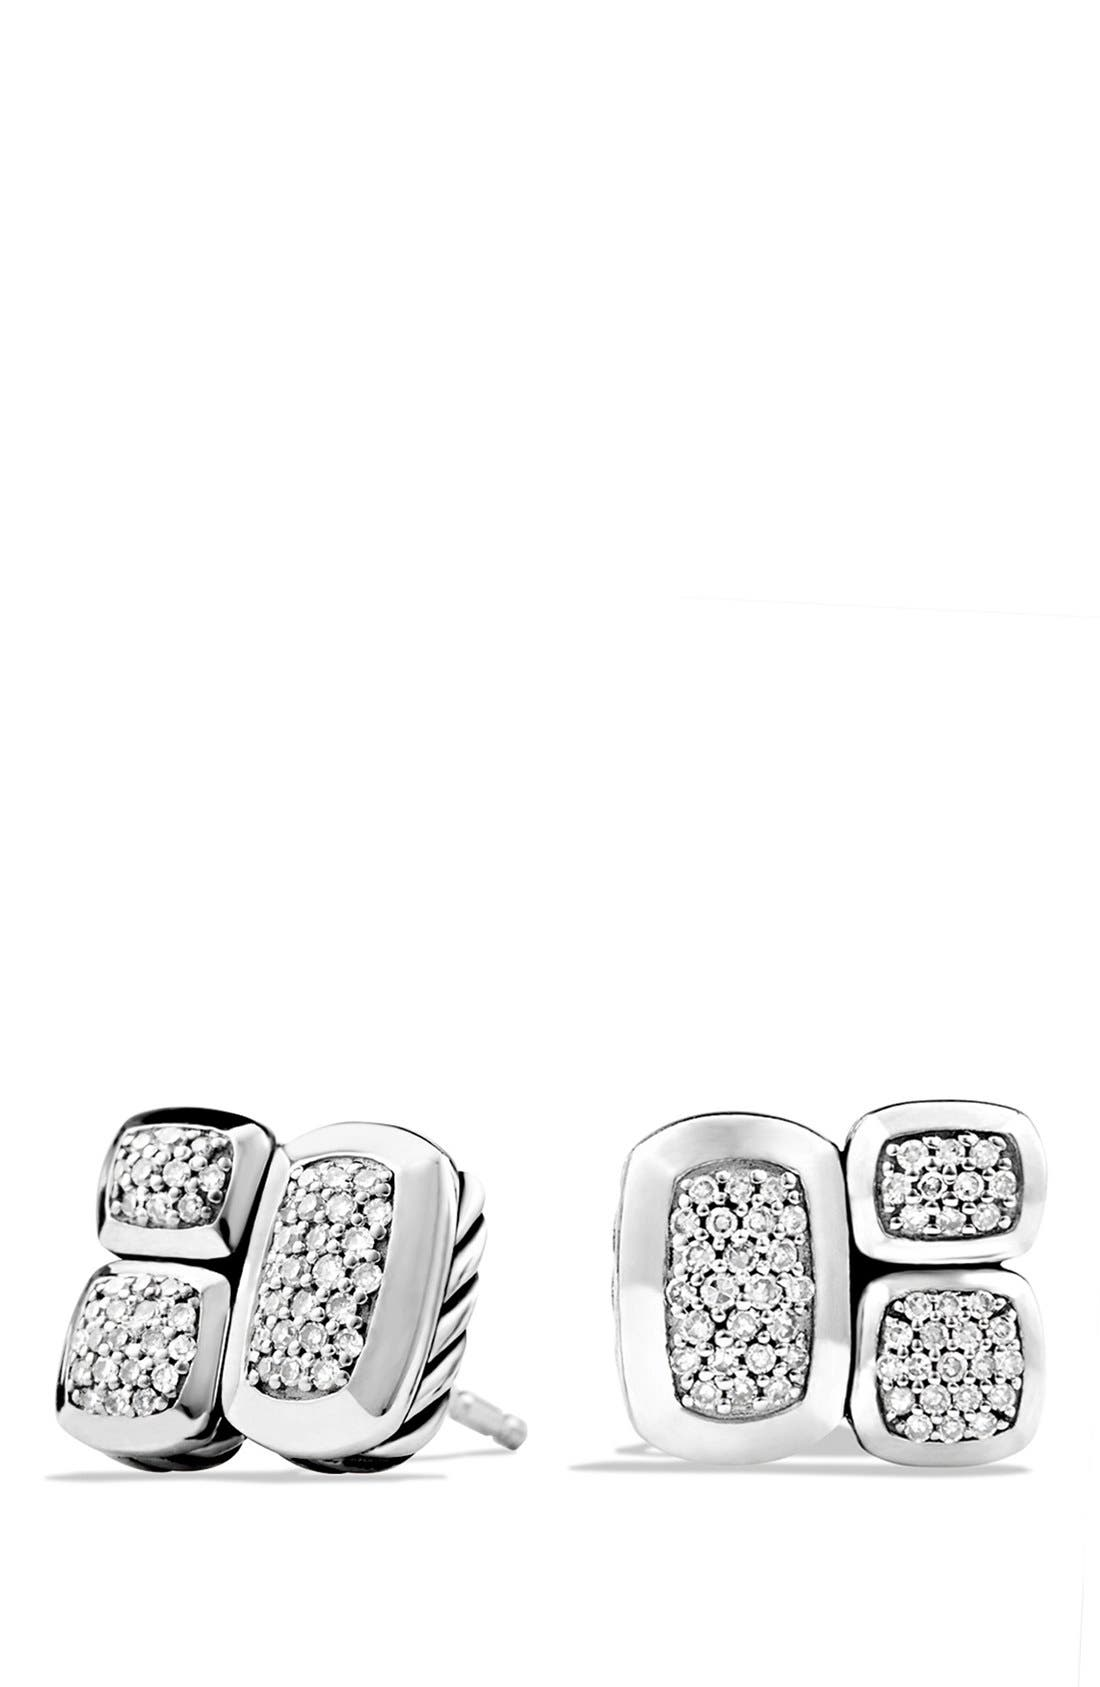 DAVID YURMAN Confetti Stud Earrings with Diamonds